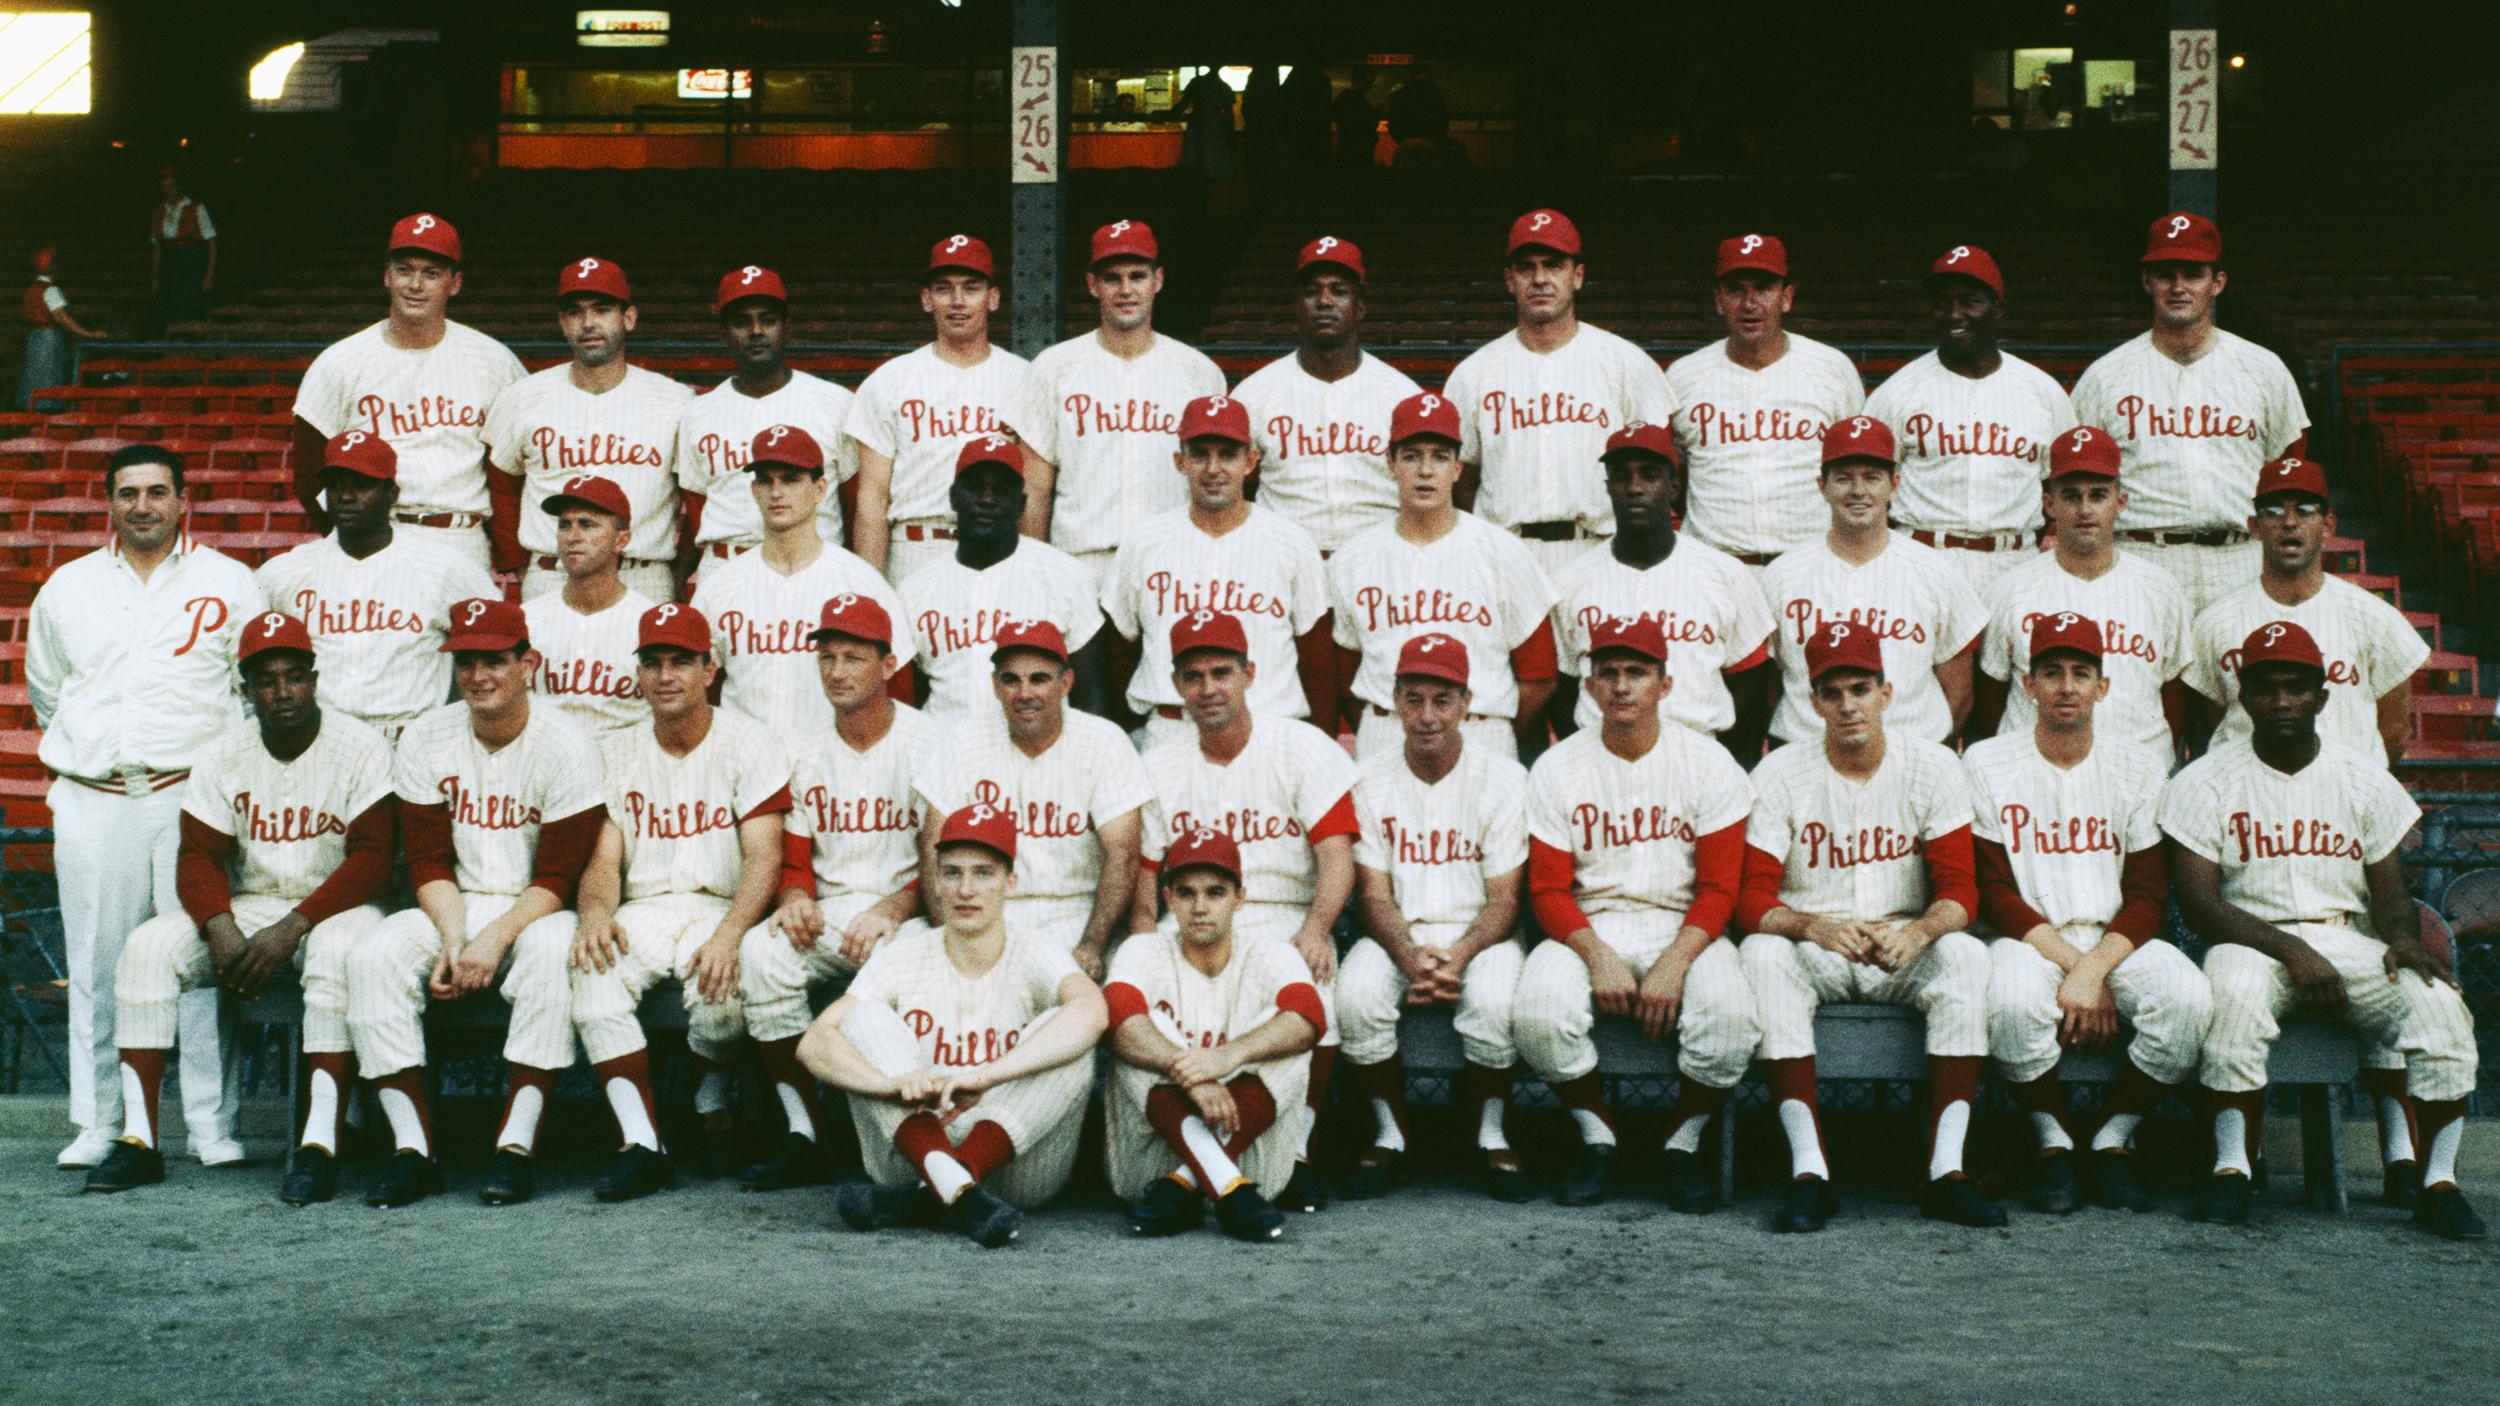 Portrait of Phillies World Series Team